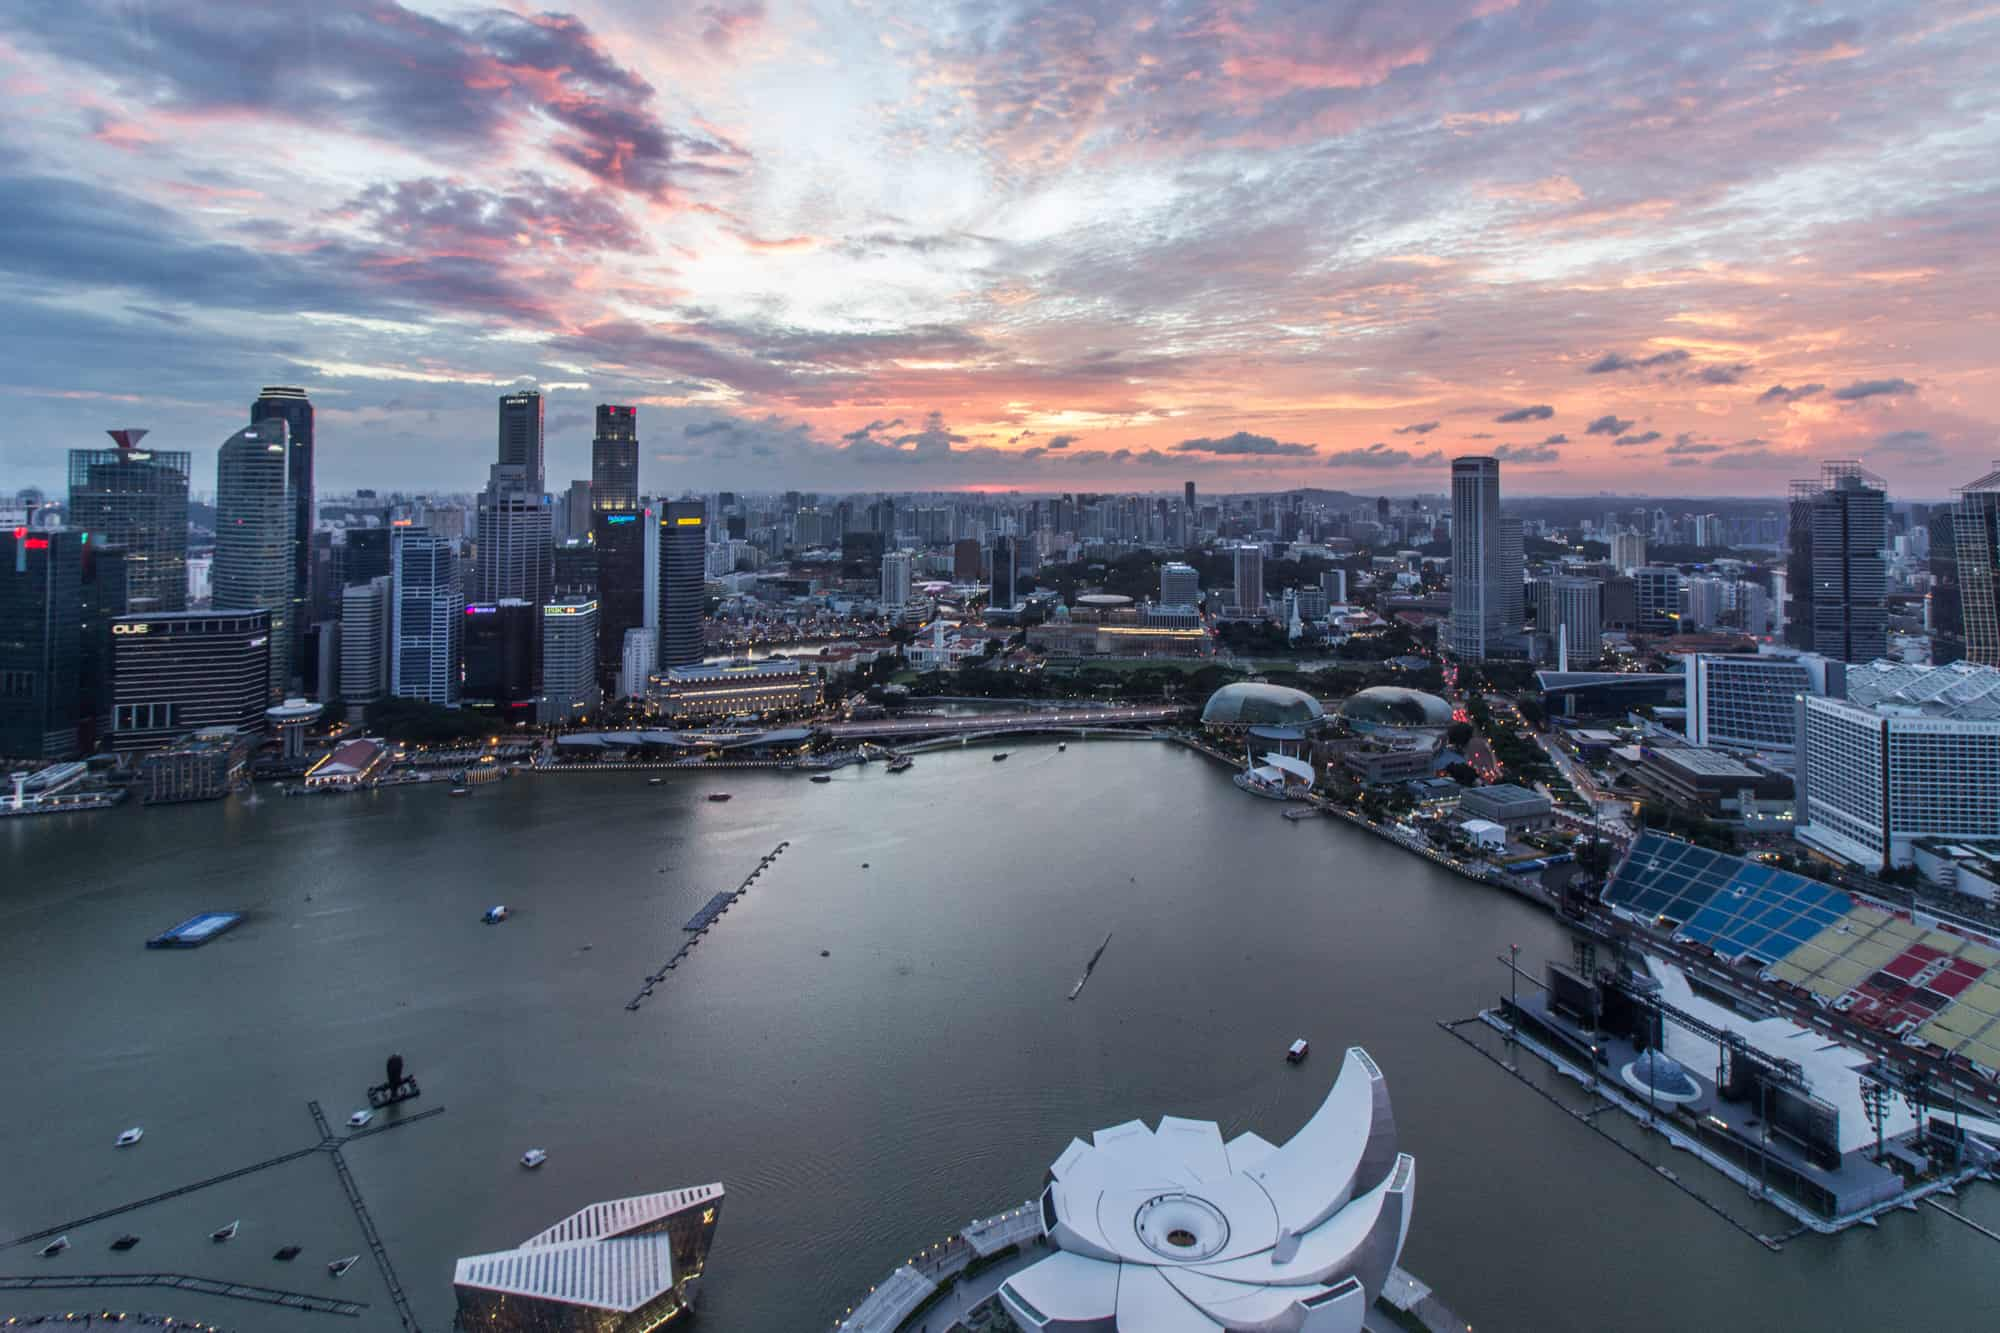 sunset singapore 3